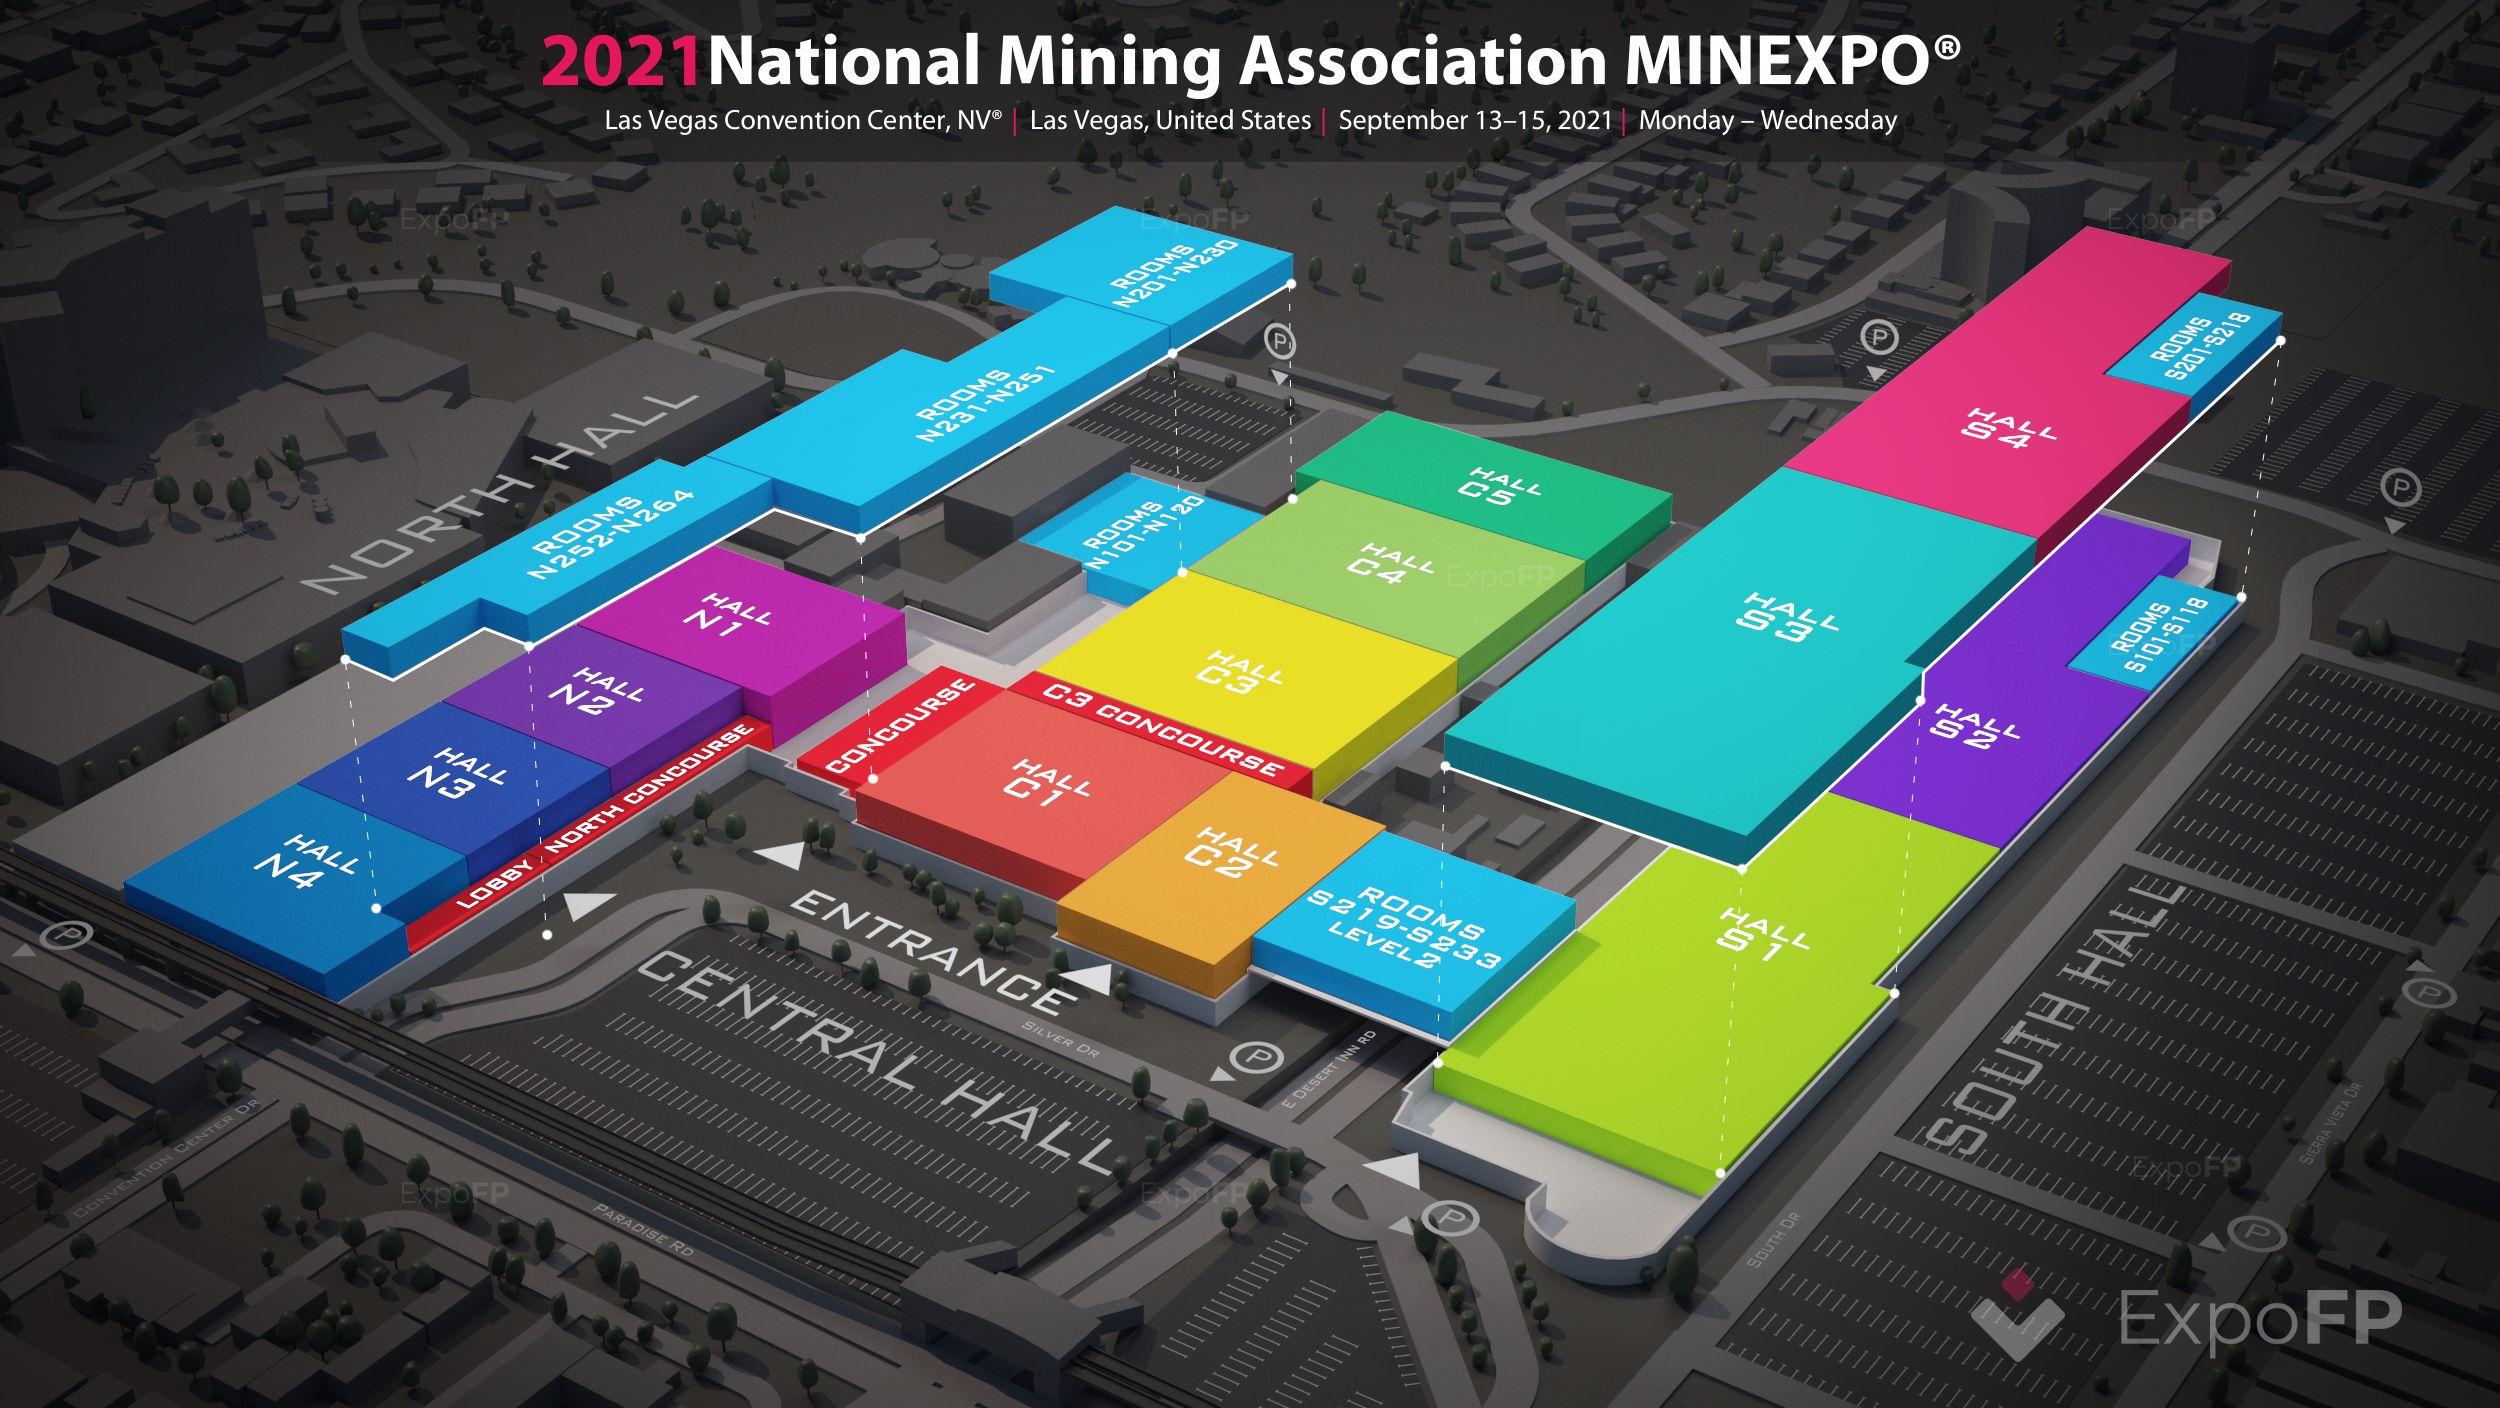 National Mining Association MINEXPO 2021 3D floor plan